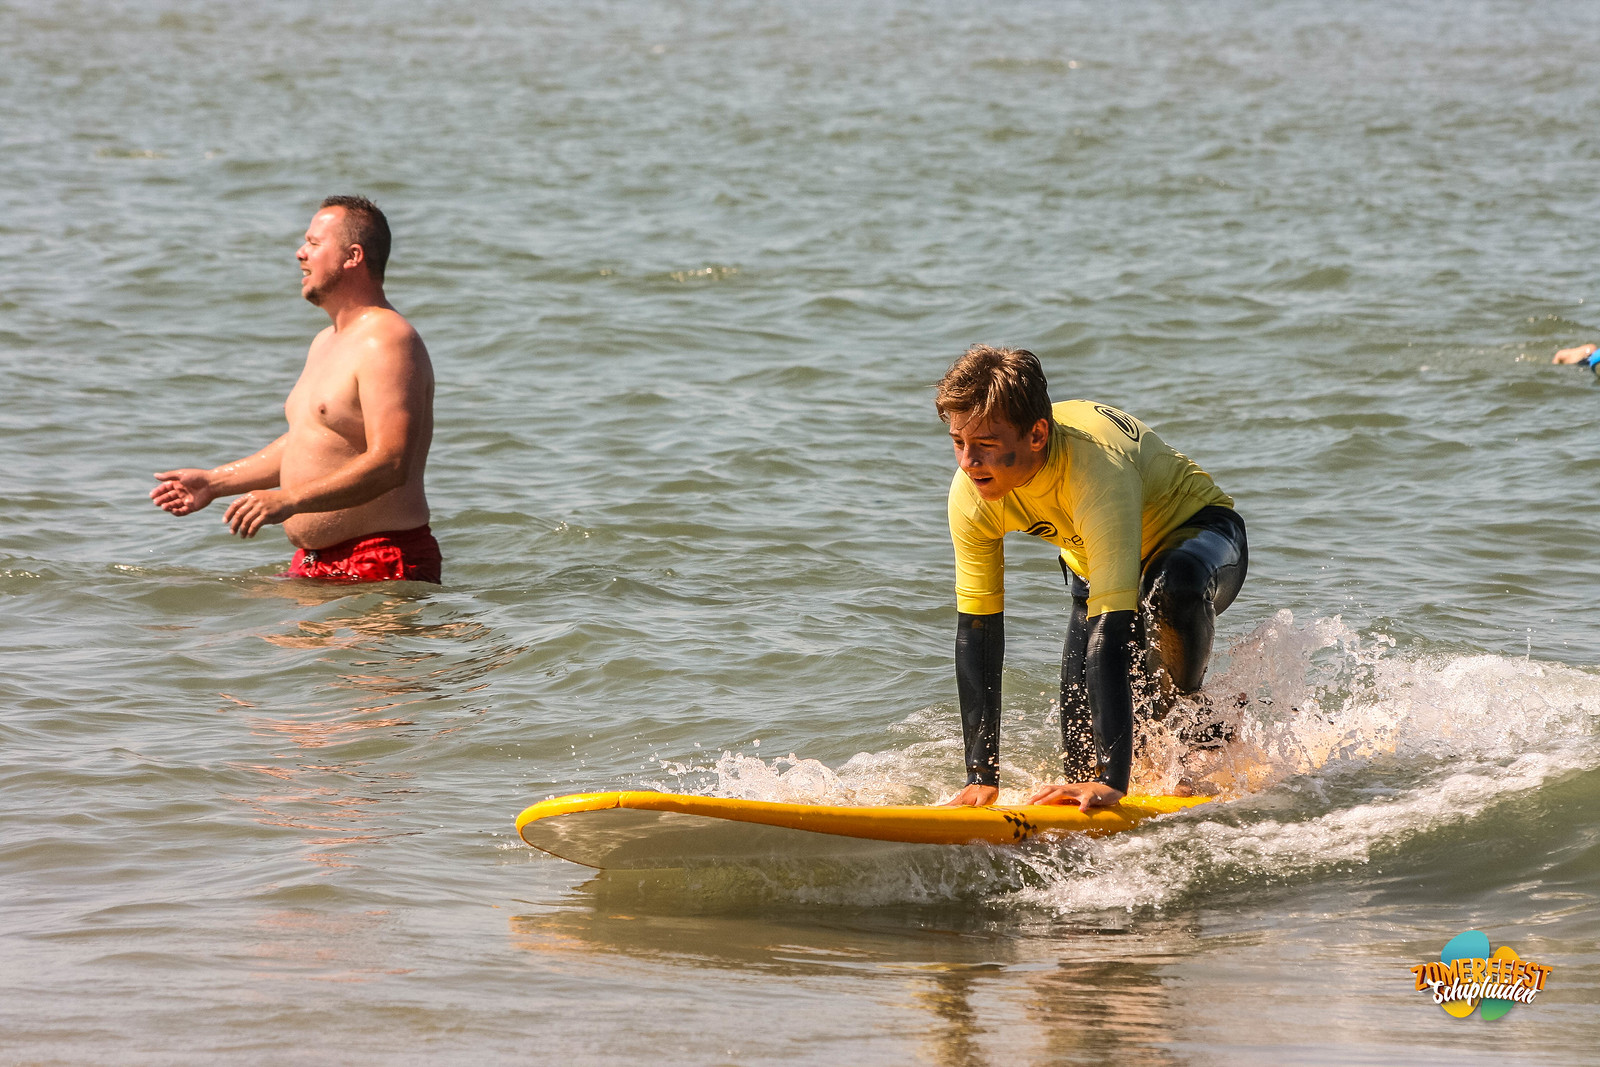 zon-zee-surf-23